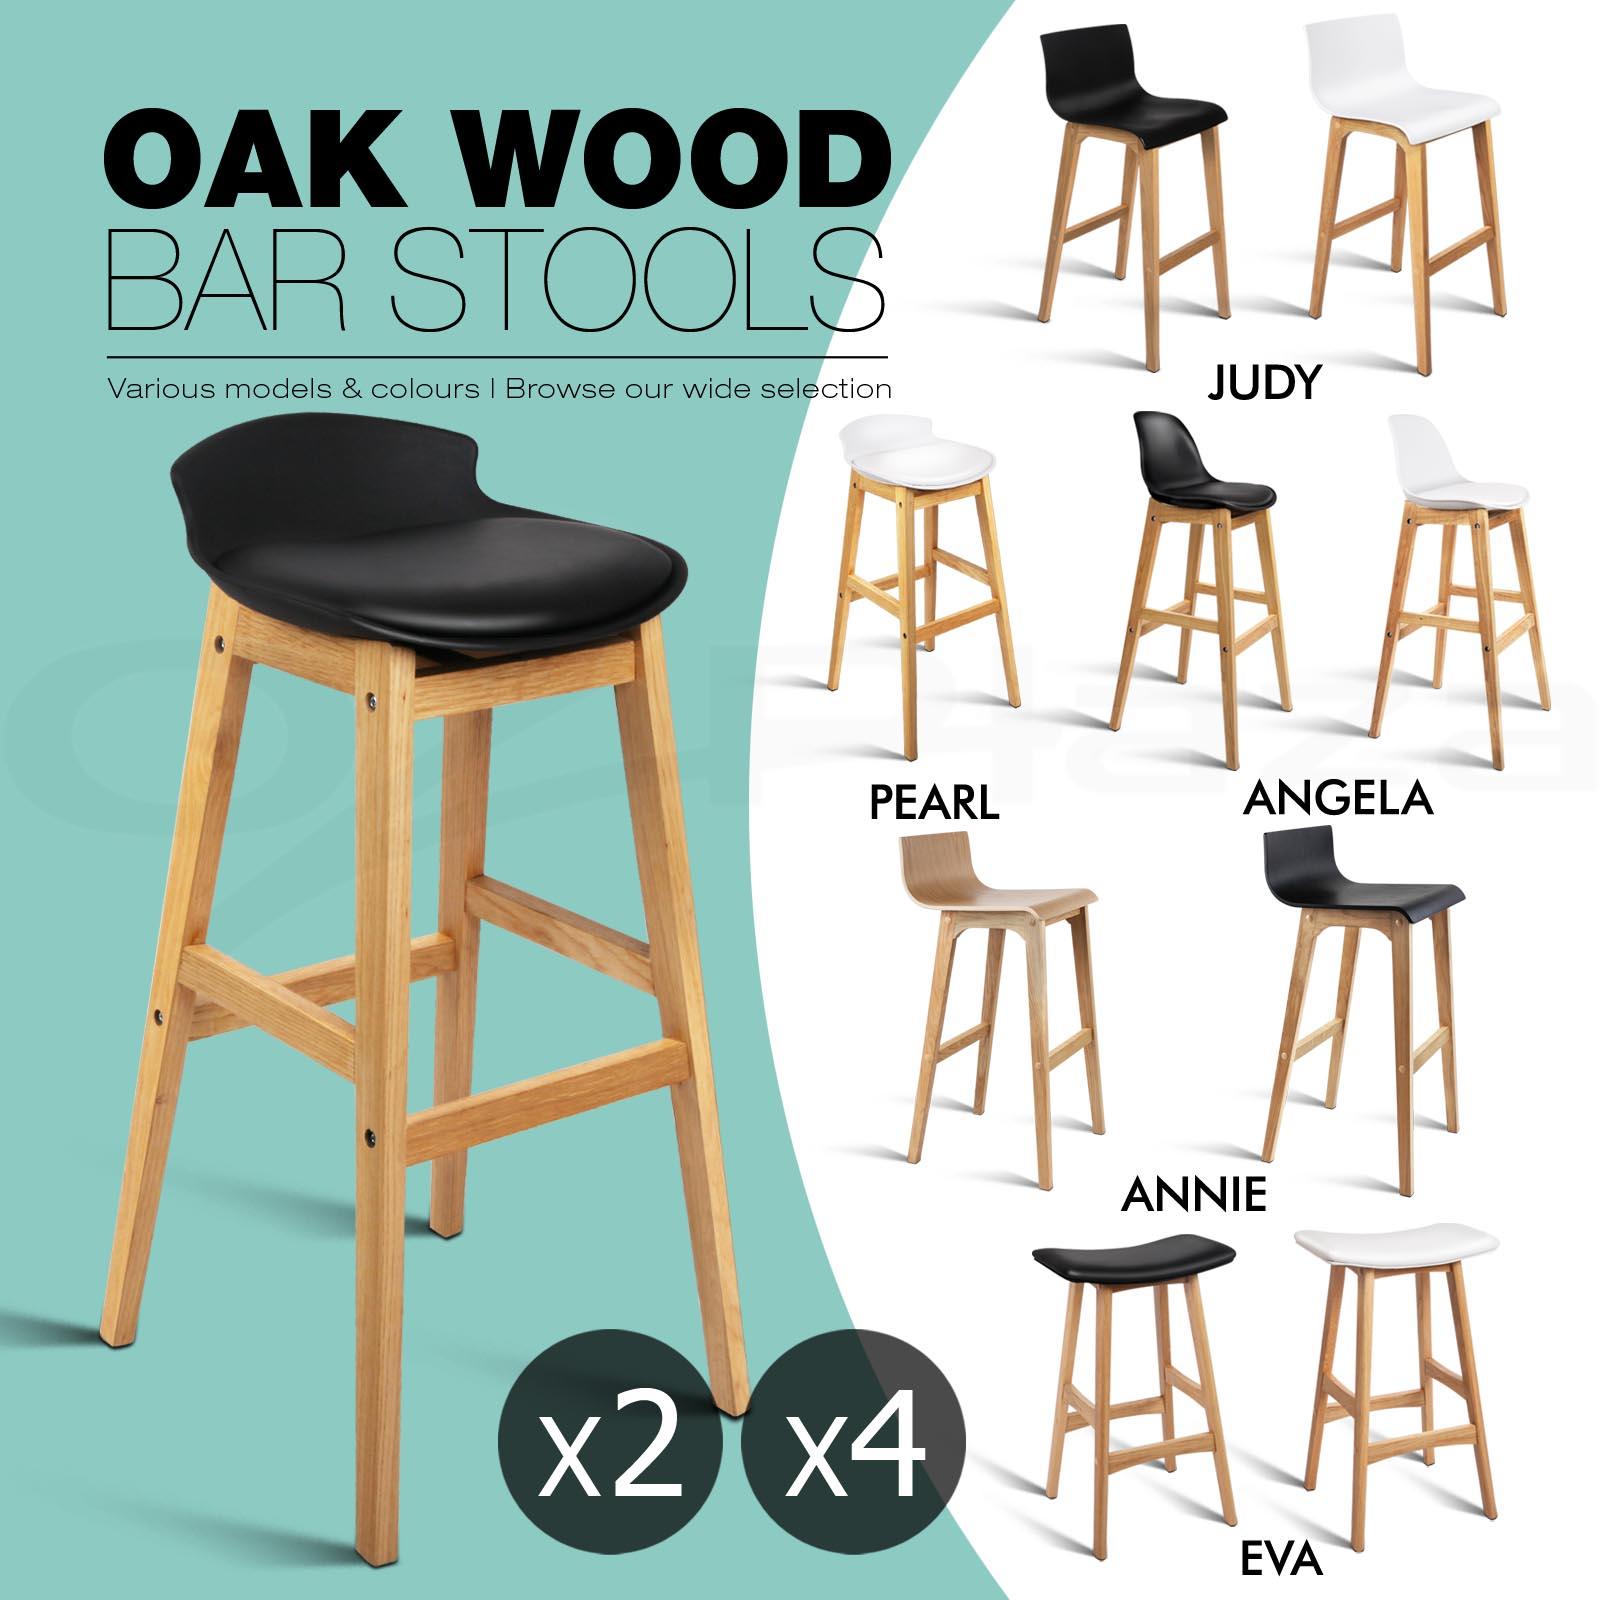 Timber Kitchen Stools: 2x/4x Oak Wood Bar Stool Wooden Barstool Timber Dining